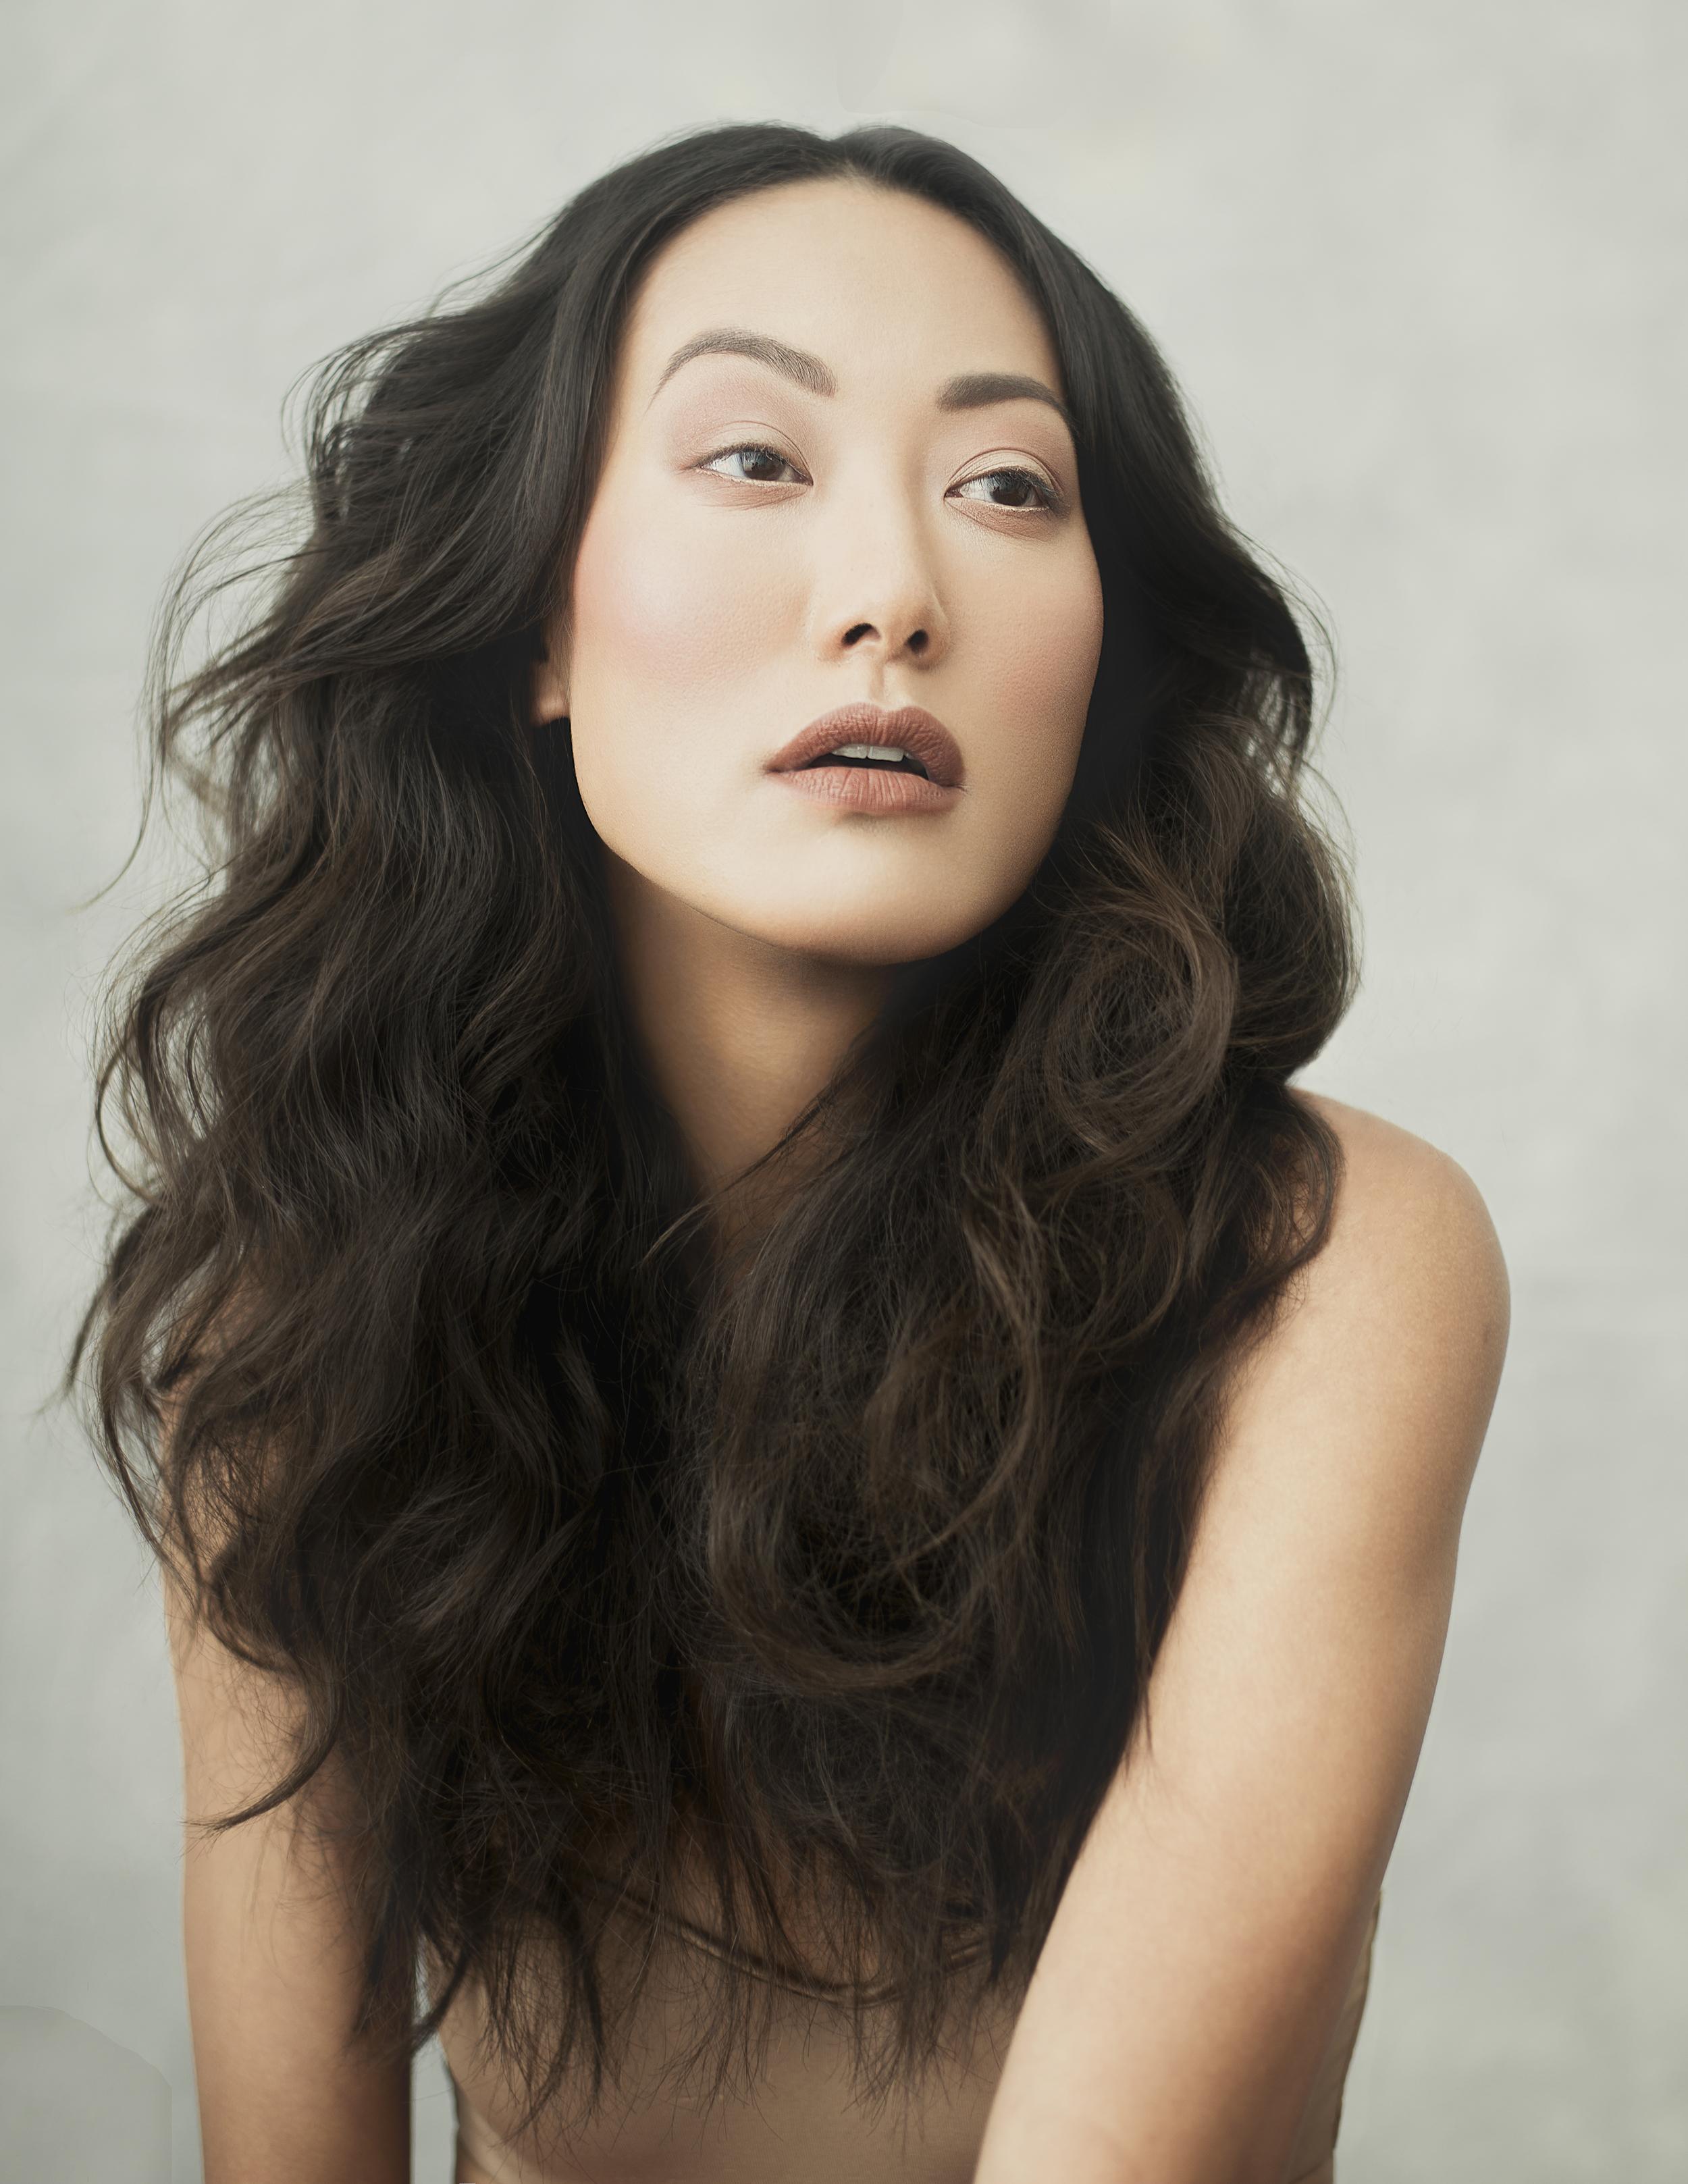 la fashion and editorial photographer alecia lindsay